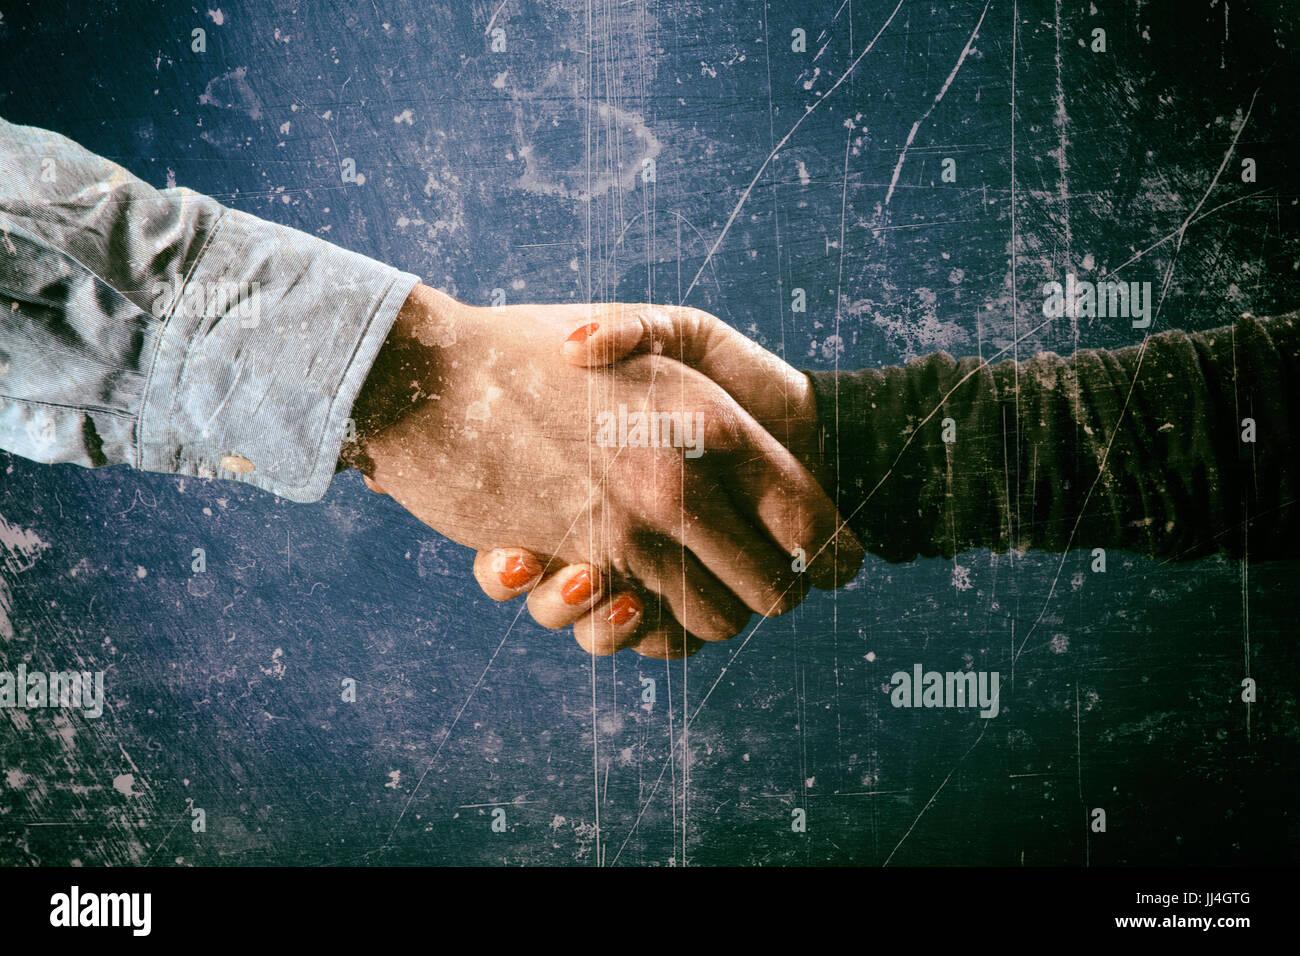 Grunge style handshake of businessman and businesswoman - Stock Image